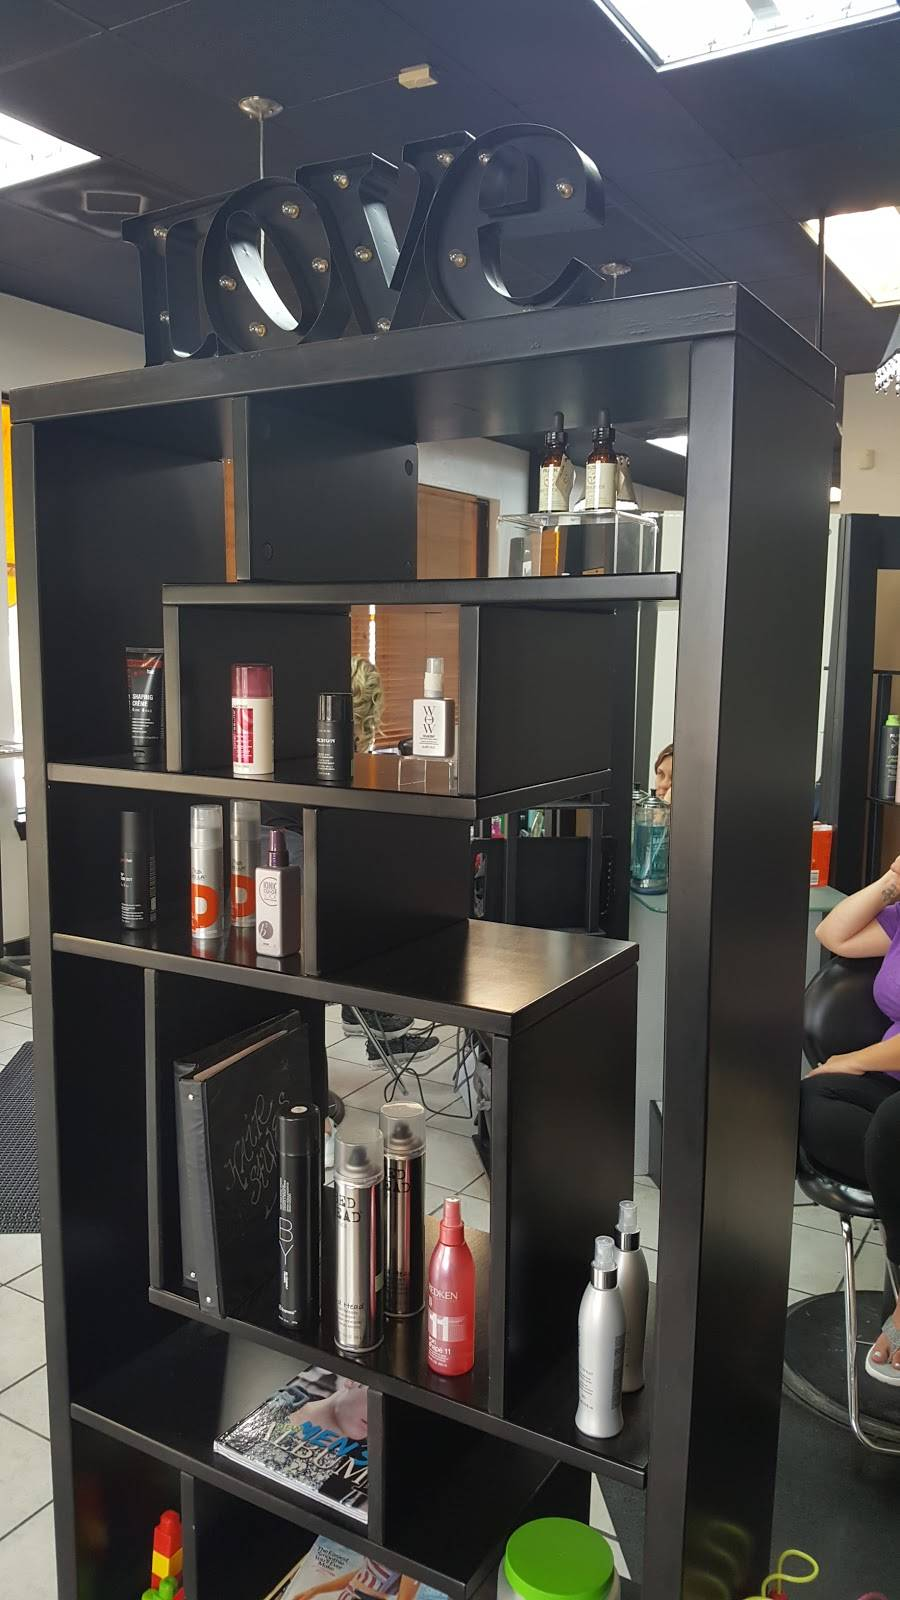 The Hair Place - hair care  | Photo 2 of 4 | Address: 1310 E Judge Perez Dr, Chalmette, LA 70043, USA | Phone: (504) 279-2887